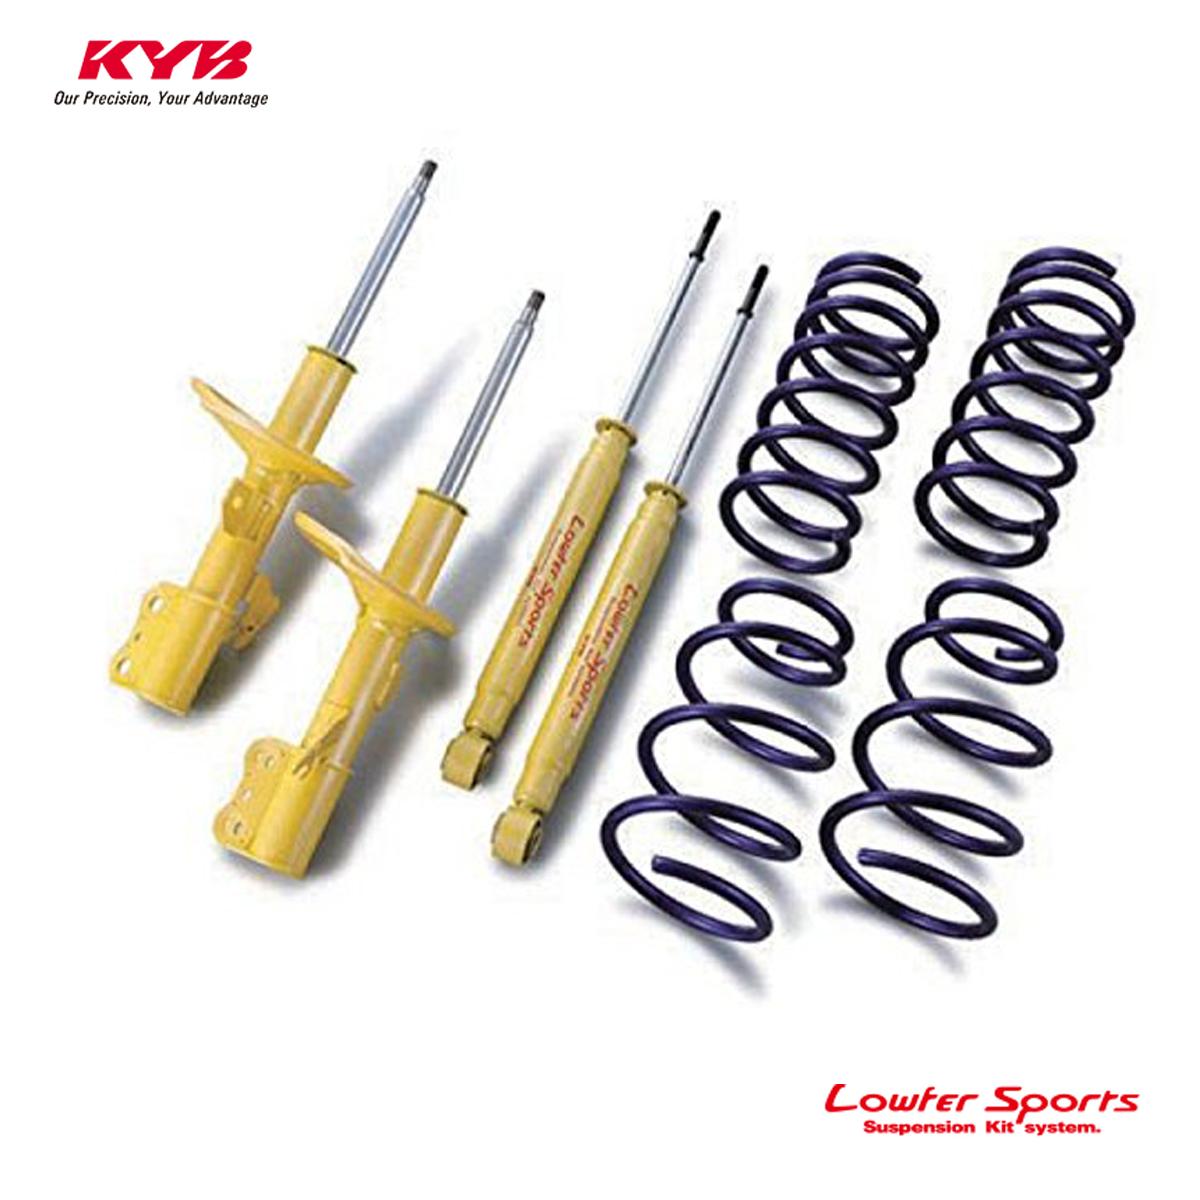 KYB カヤバ MRワゴン MF33S ショックアブソーバー サスペンションキット Lowfer Sports LKIT-MF33TB 配送先条件有り